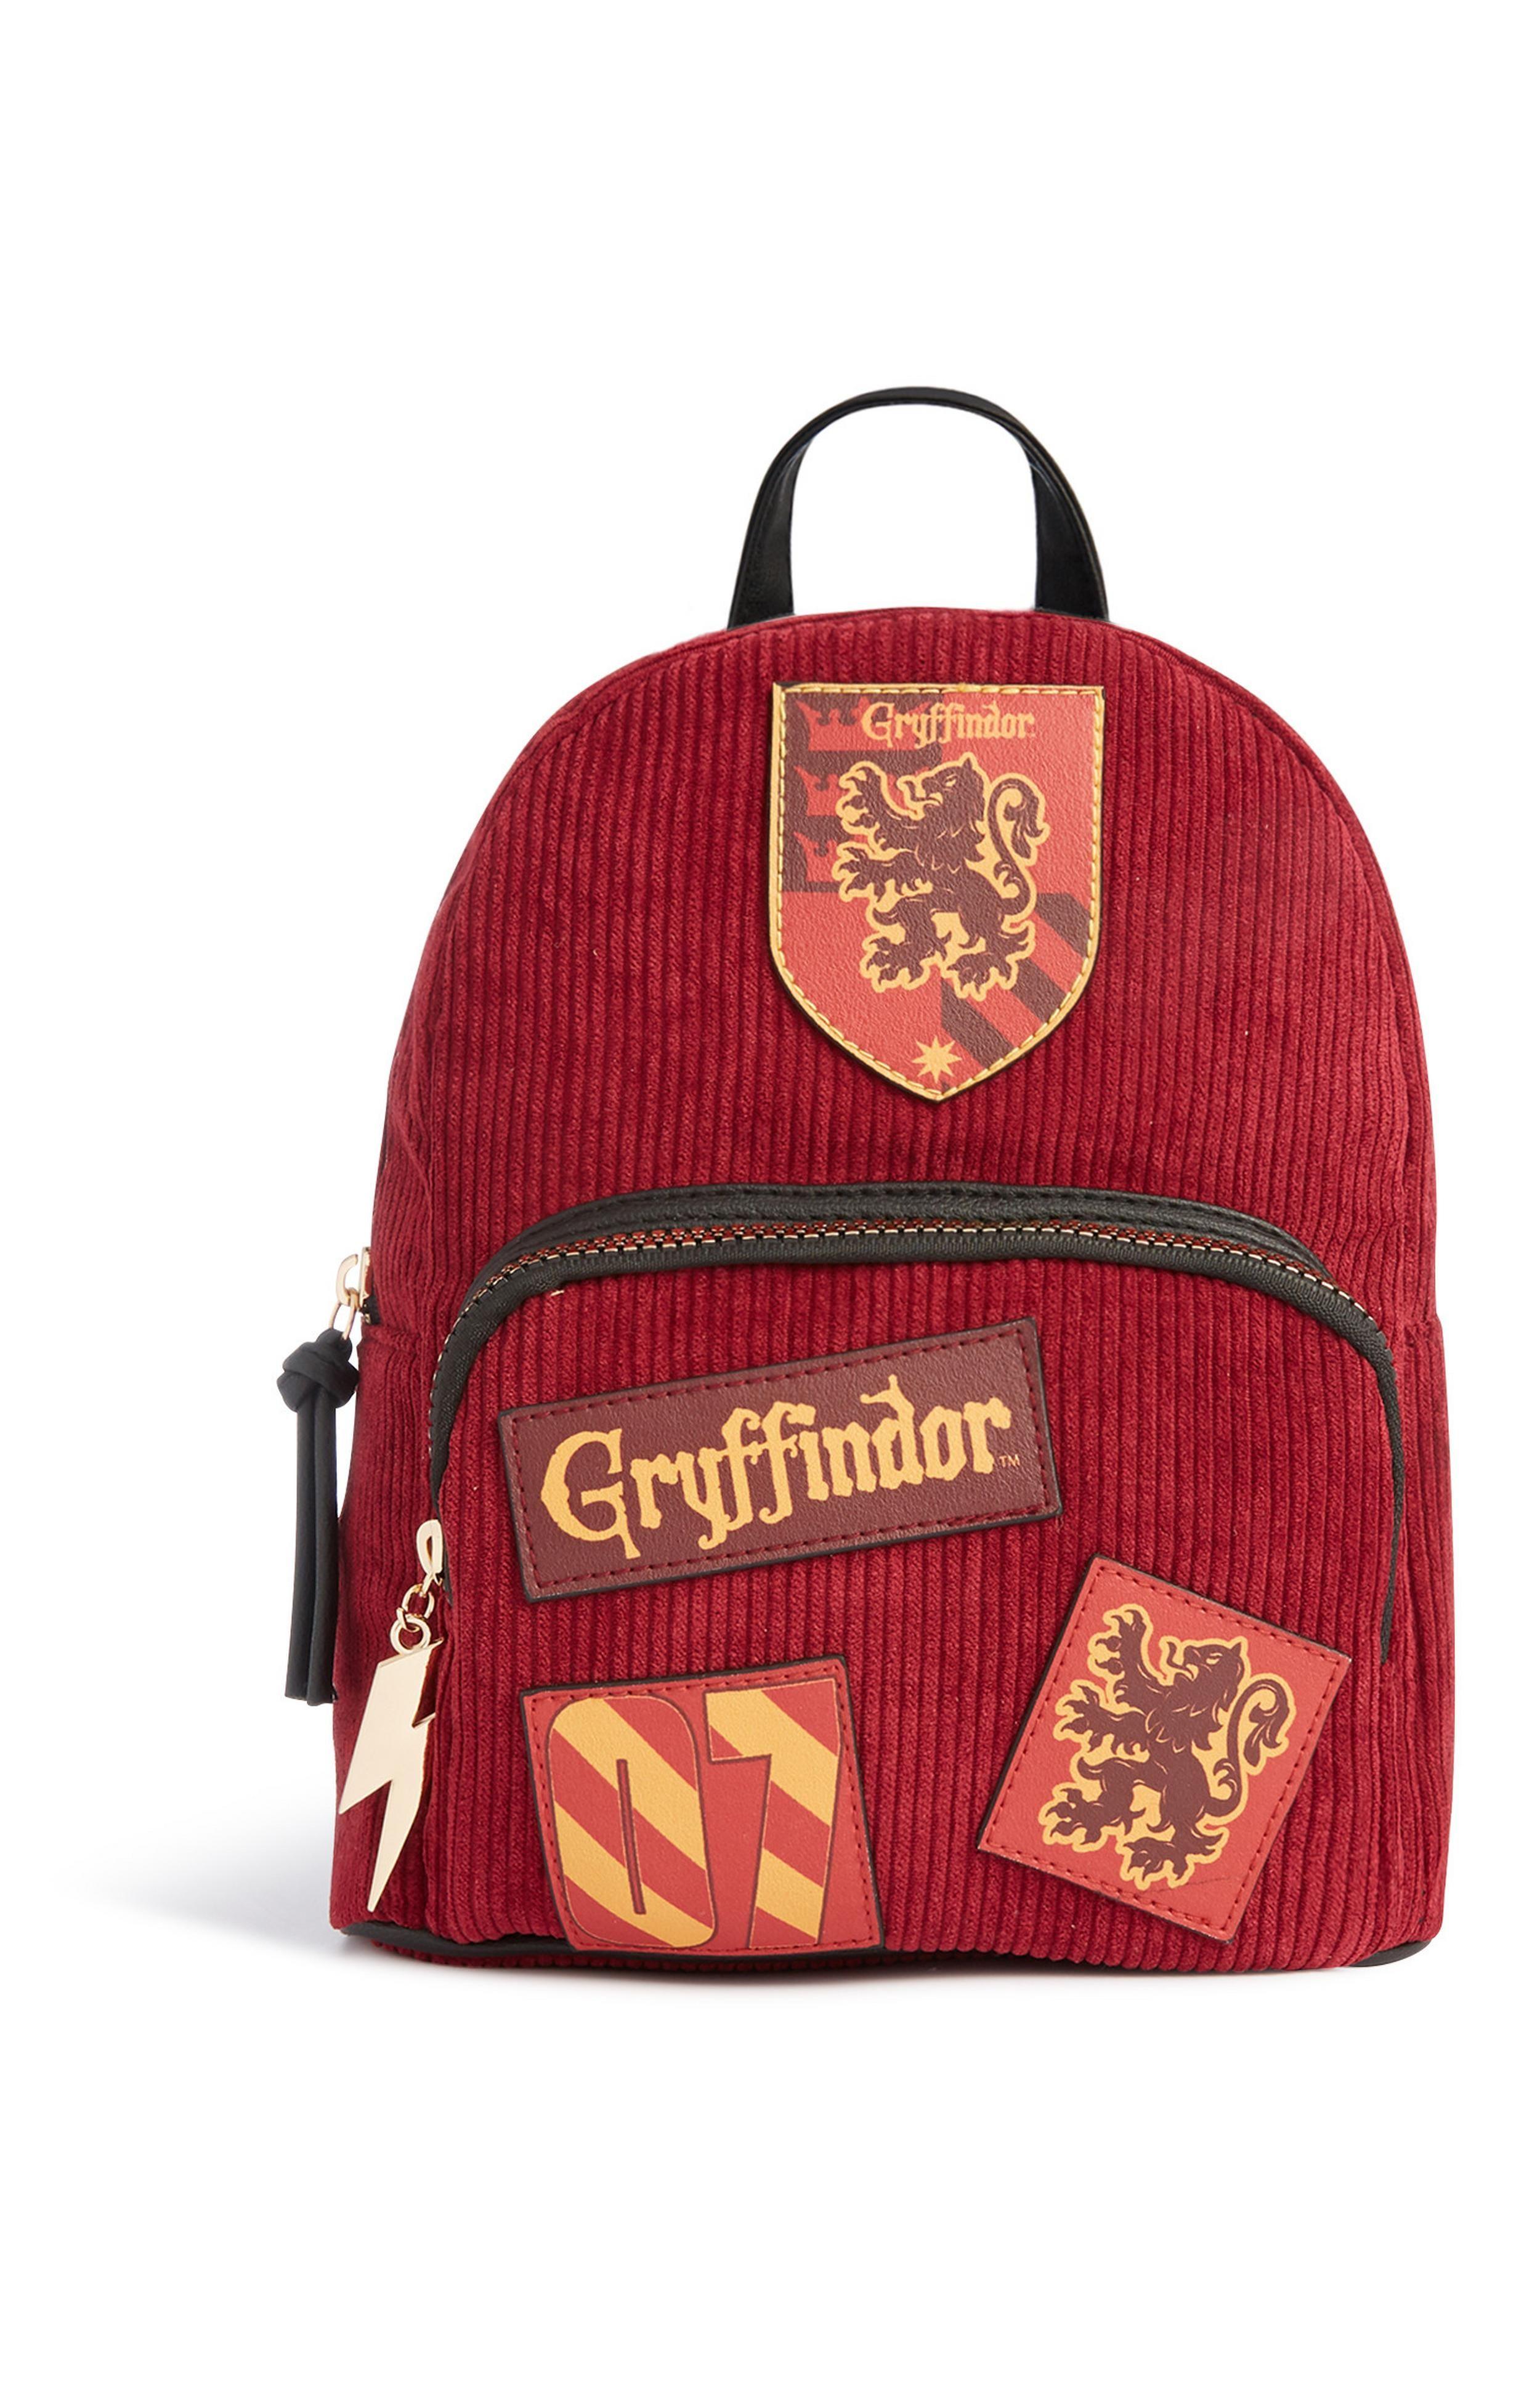 Gryffindor Slytherin Hufflepuff Ravenclaw Harry Potter Cord Backpacks